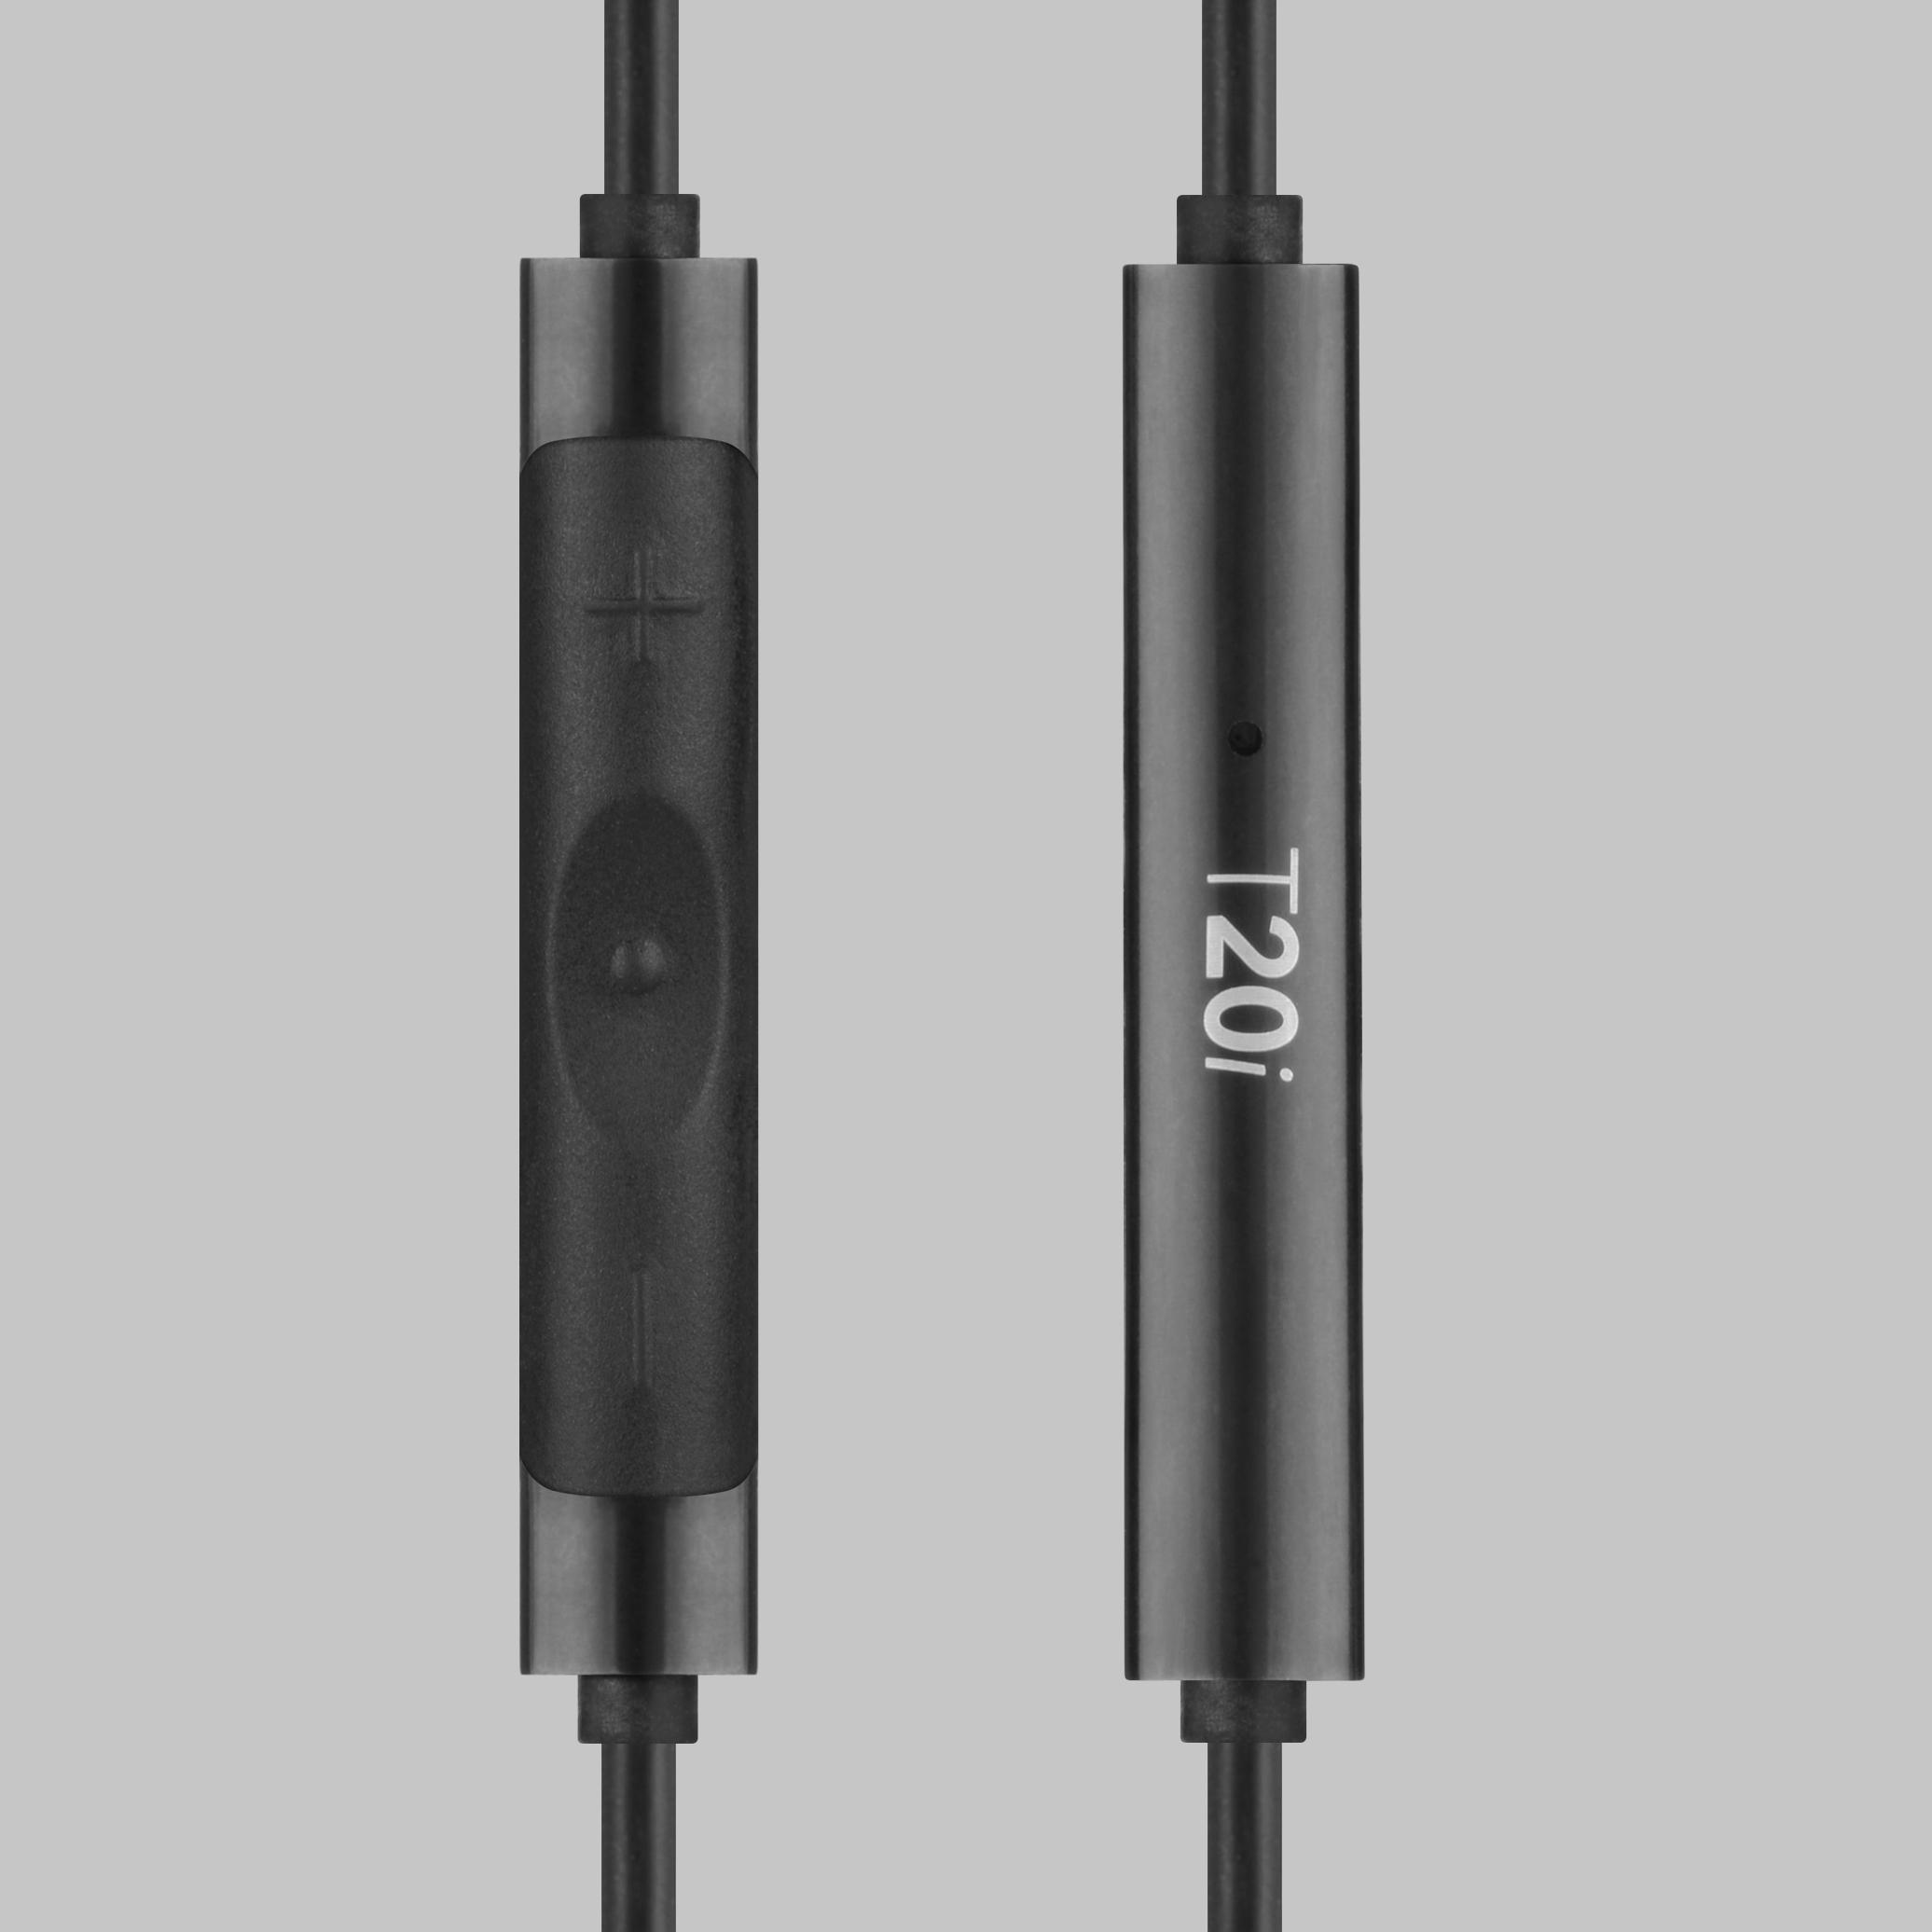 Black T20i-remotes (thumb).jpg